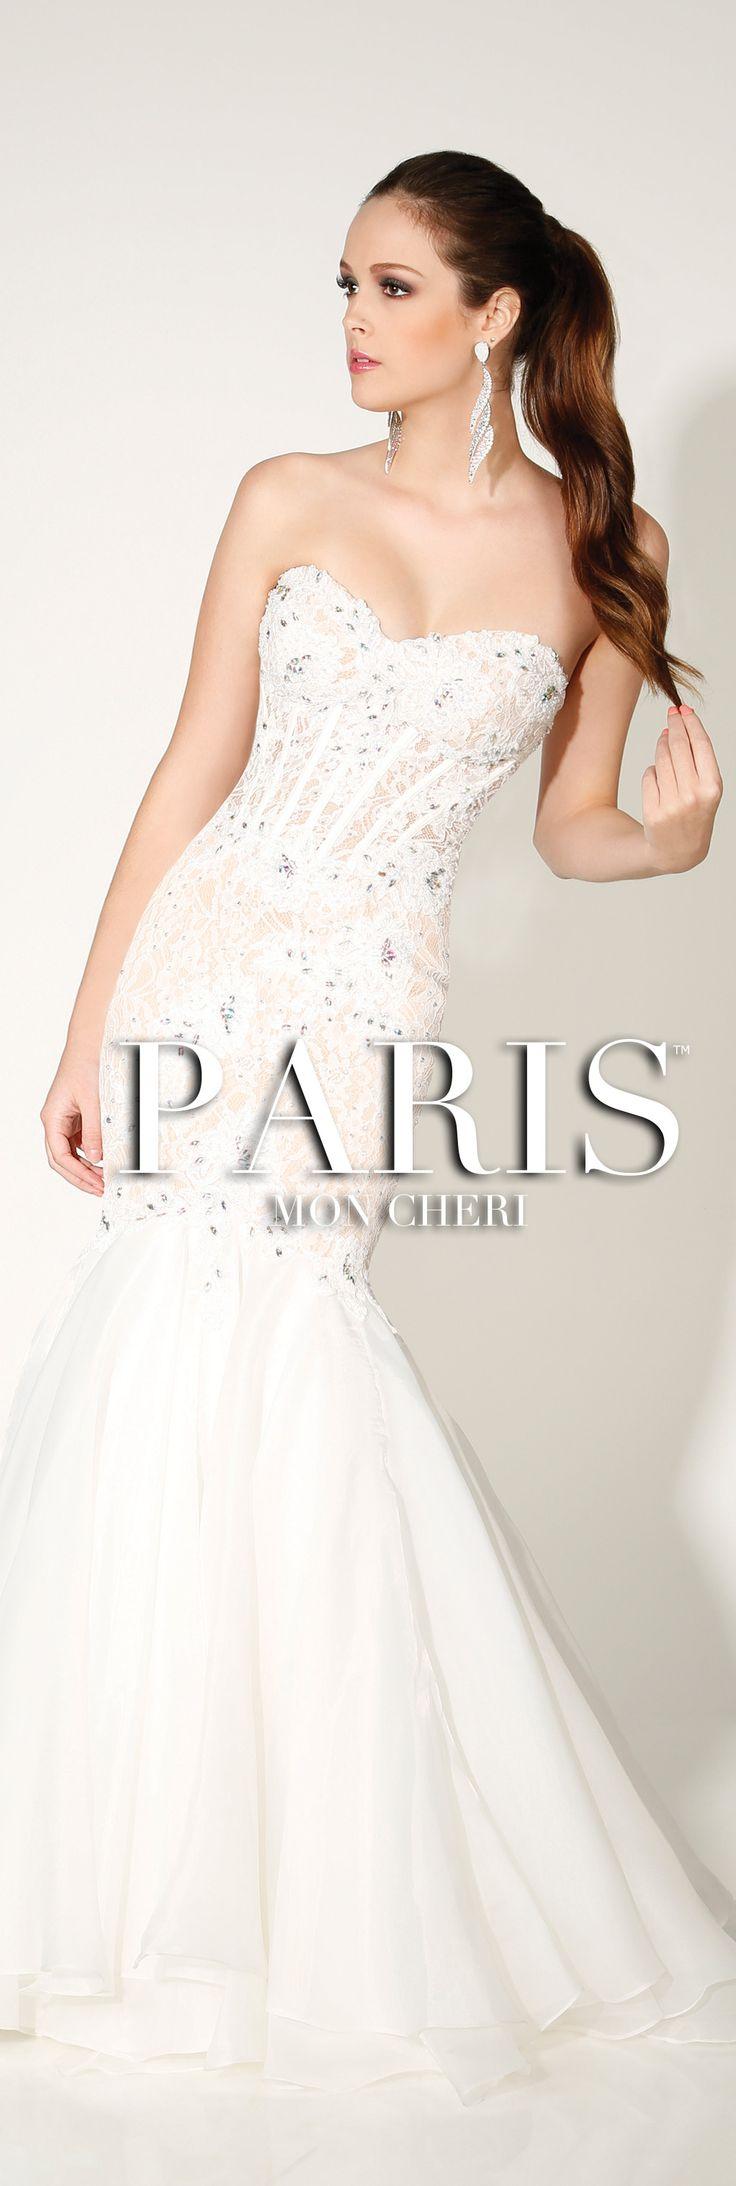 Paris by Mon Cheri Spring 2016 - Style No. 116743 #promdresses